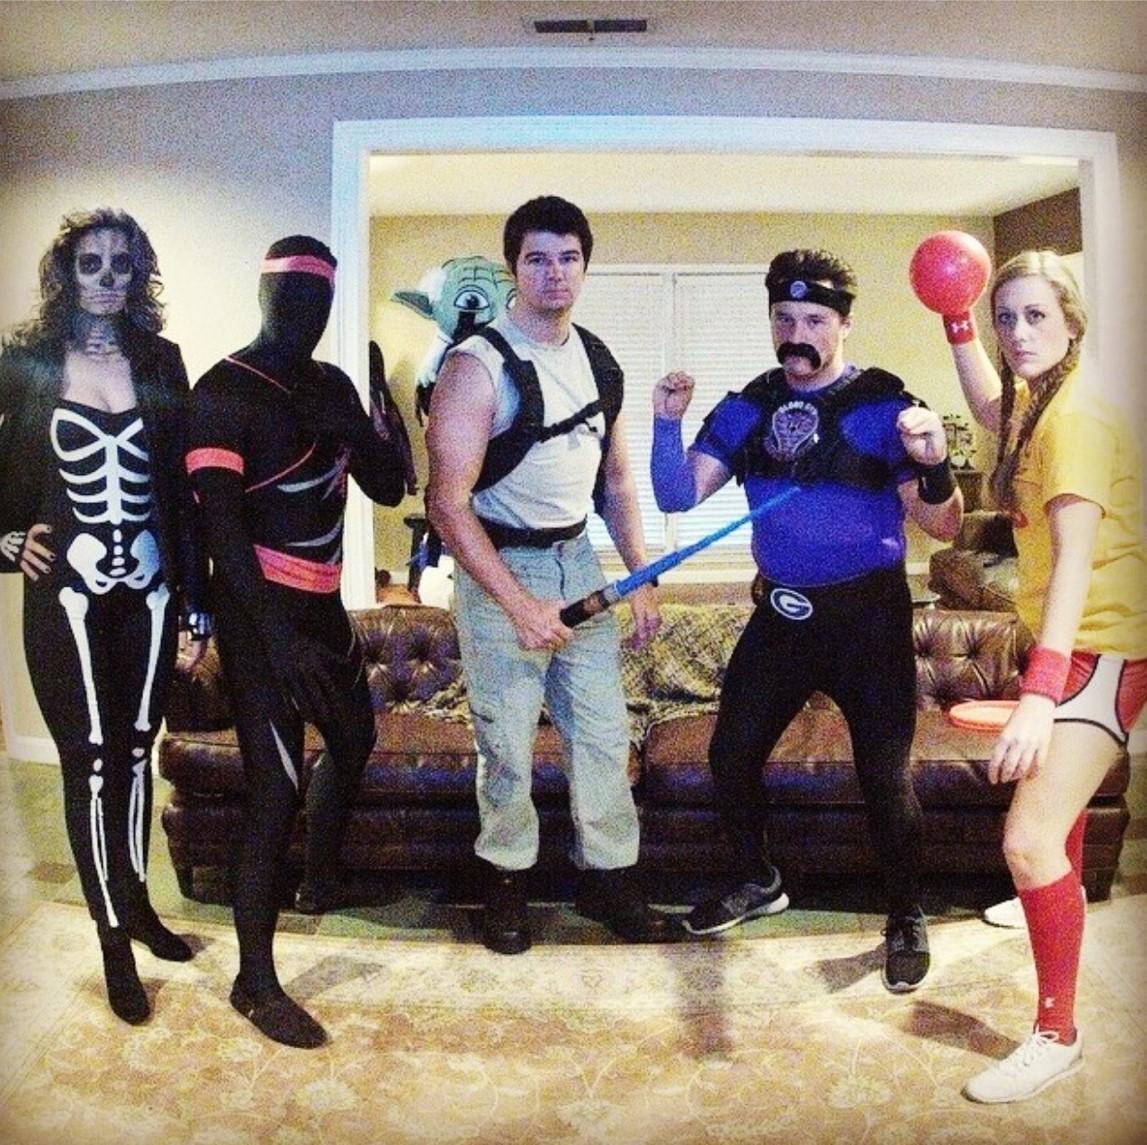 The Famous Jedi | Halloween 2014